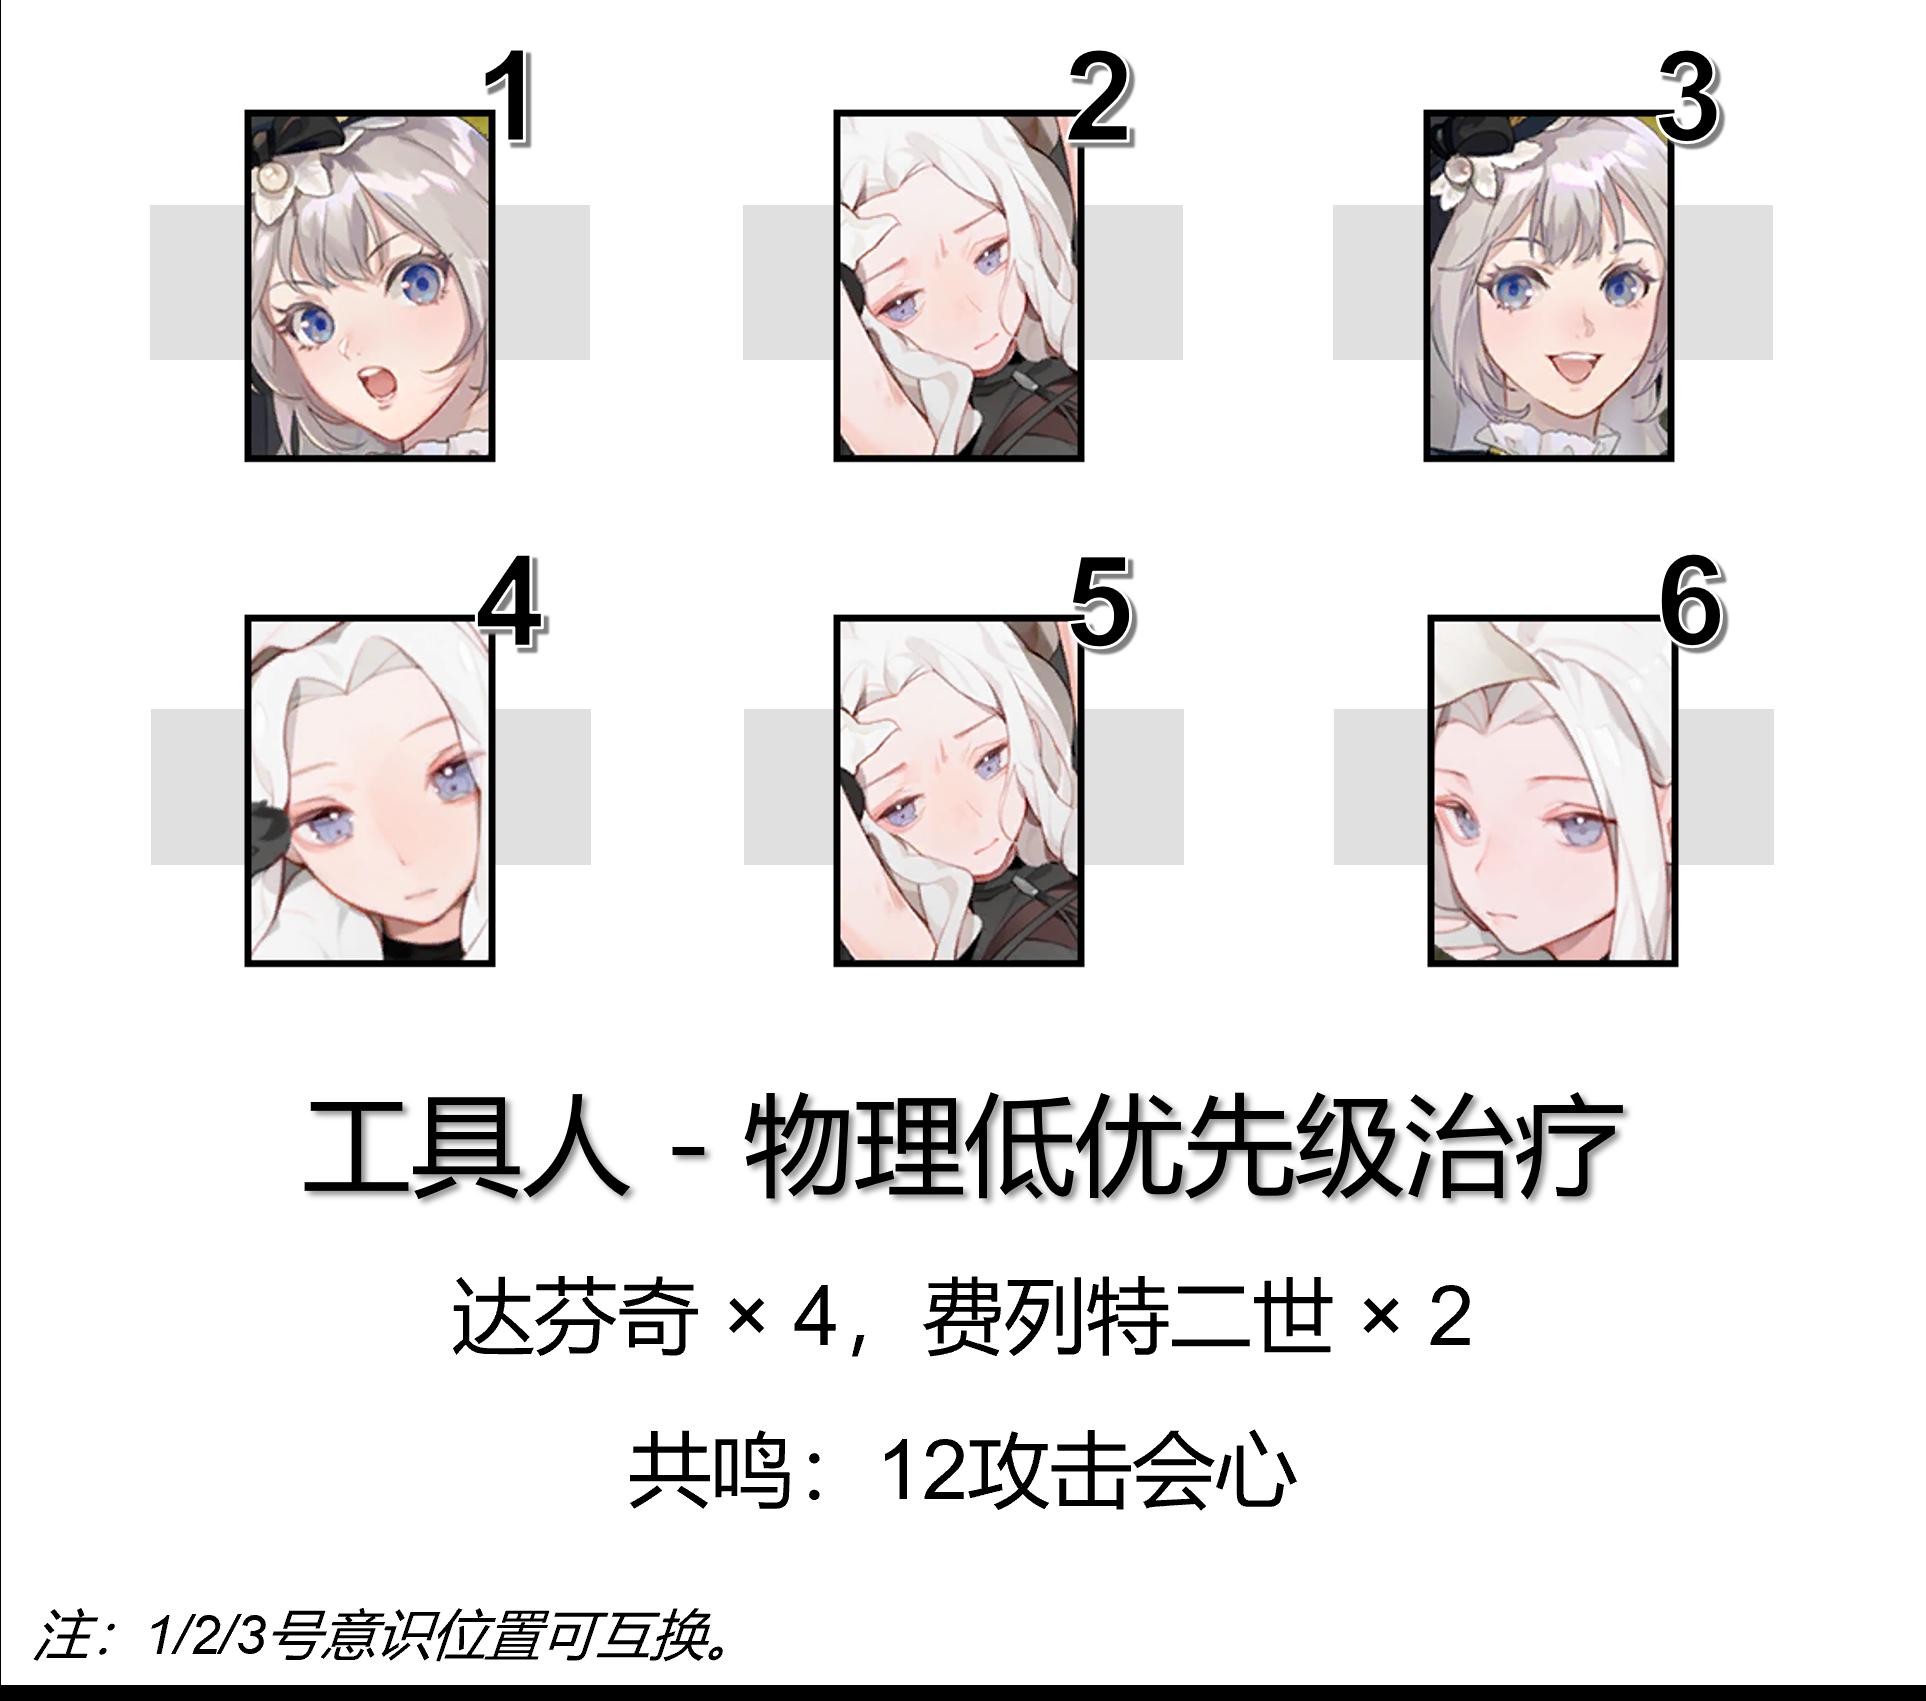 PP 丽芙·仰光 意识推荐1.png